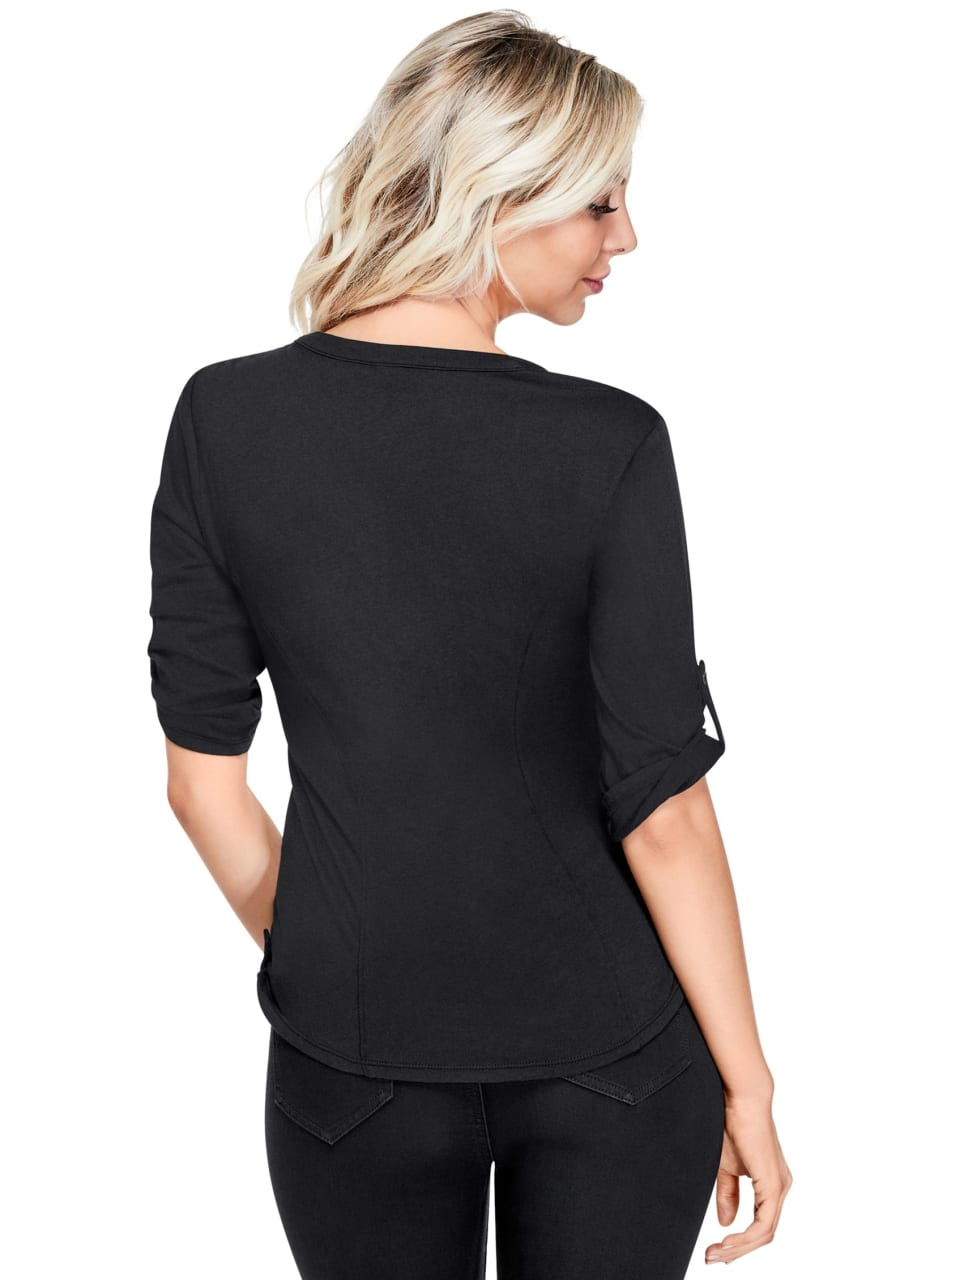 GUESS-Factory-Women-039-s-Skylar-Flap-Pocket-Top thumbnail 8